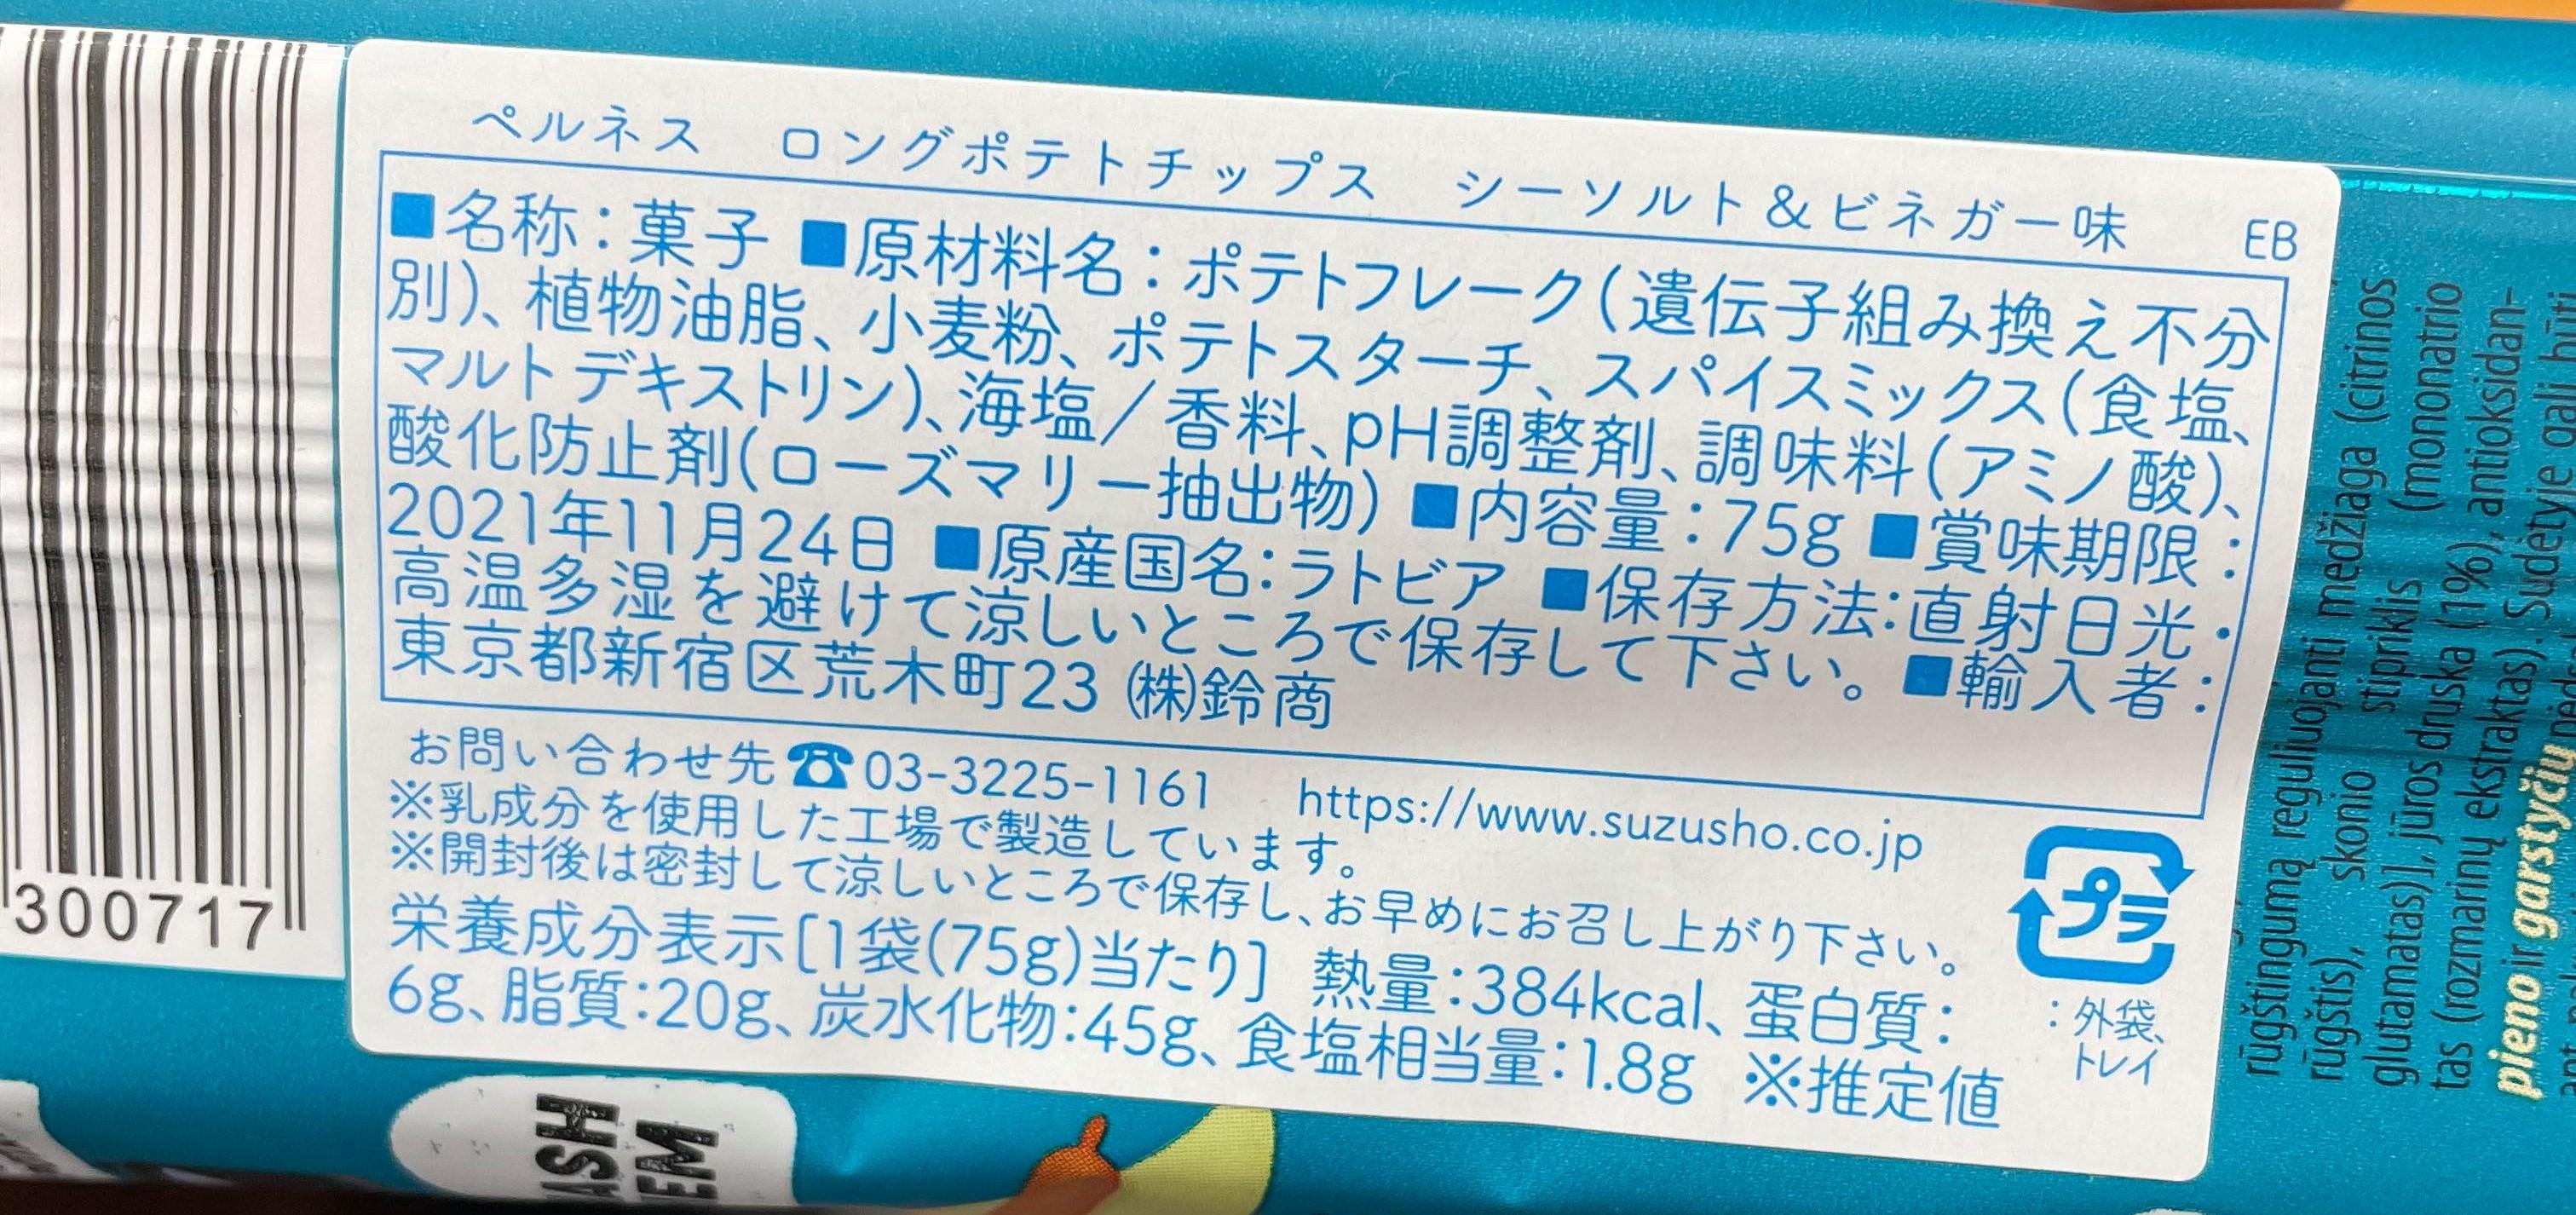 Pernes Long Chips, Sea Salt and Vinegar, back of package